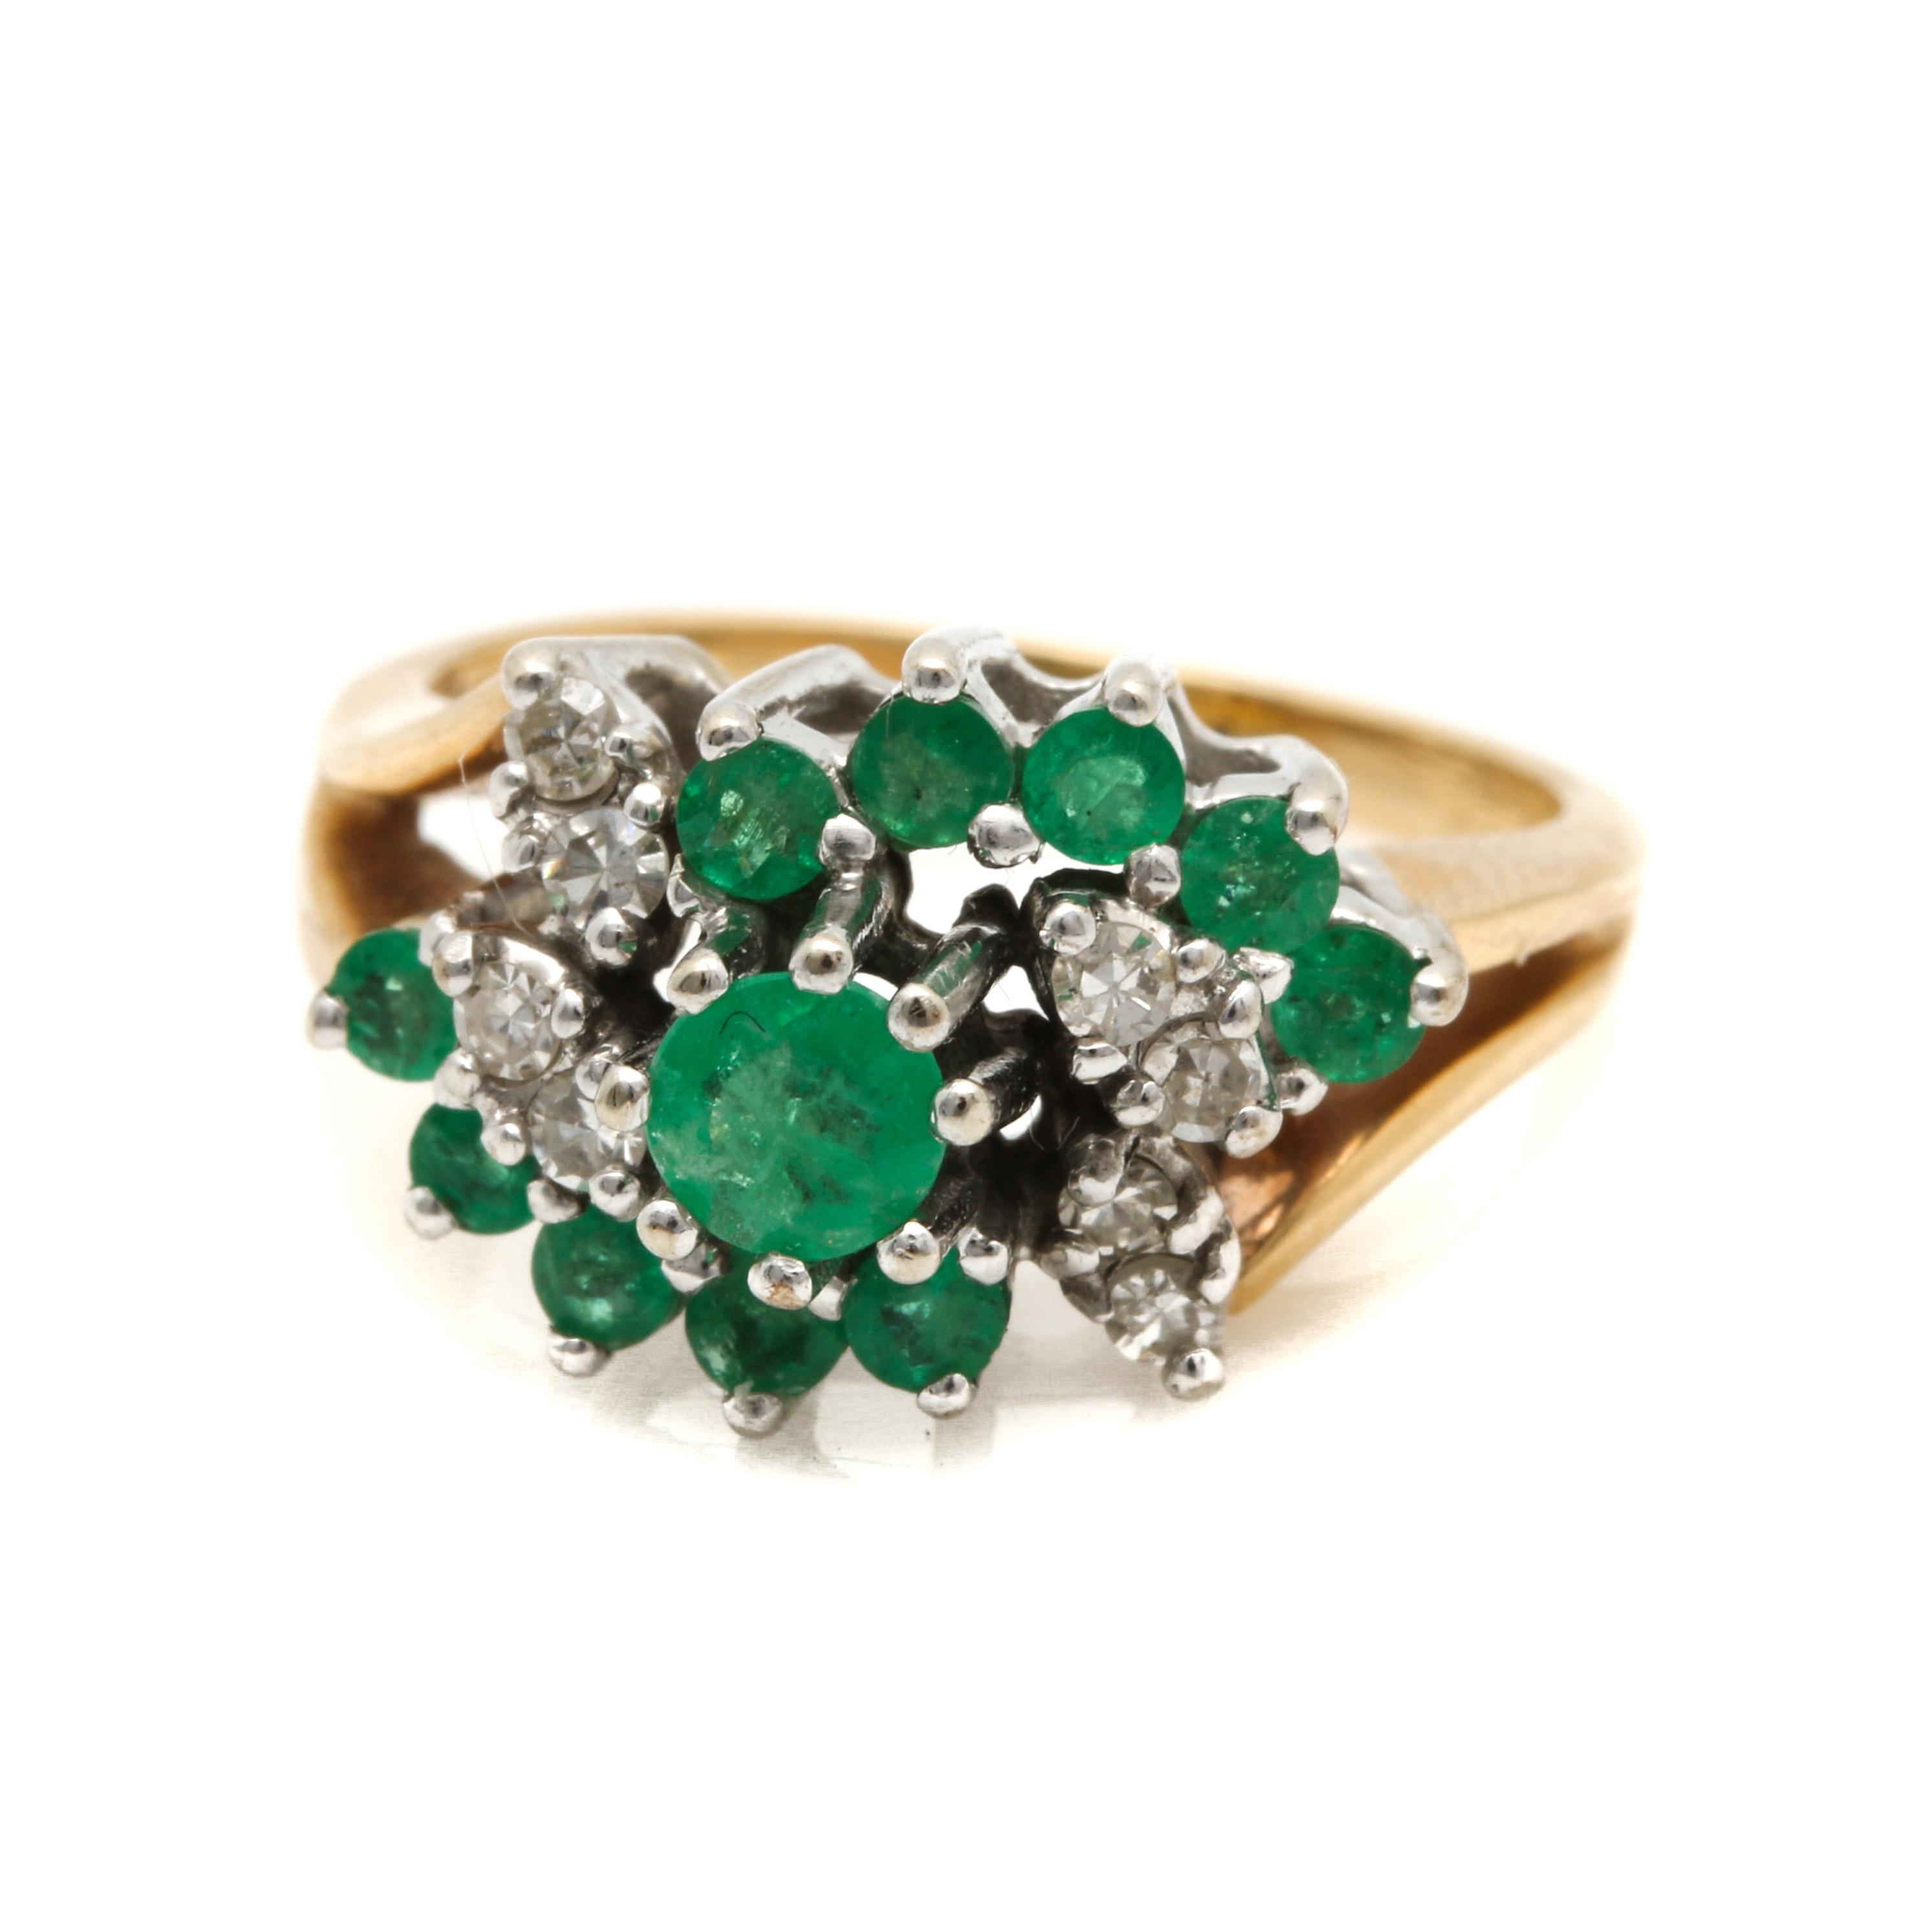 14K Yellow and White Gold Emerald and Diamond Swirl Ring